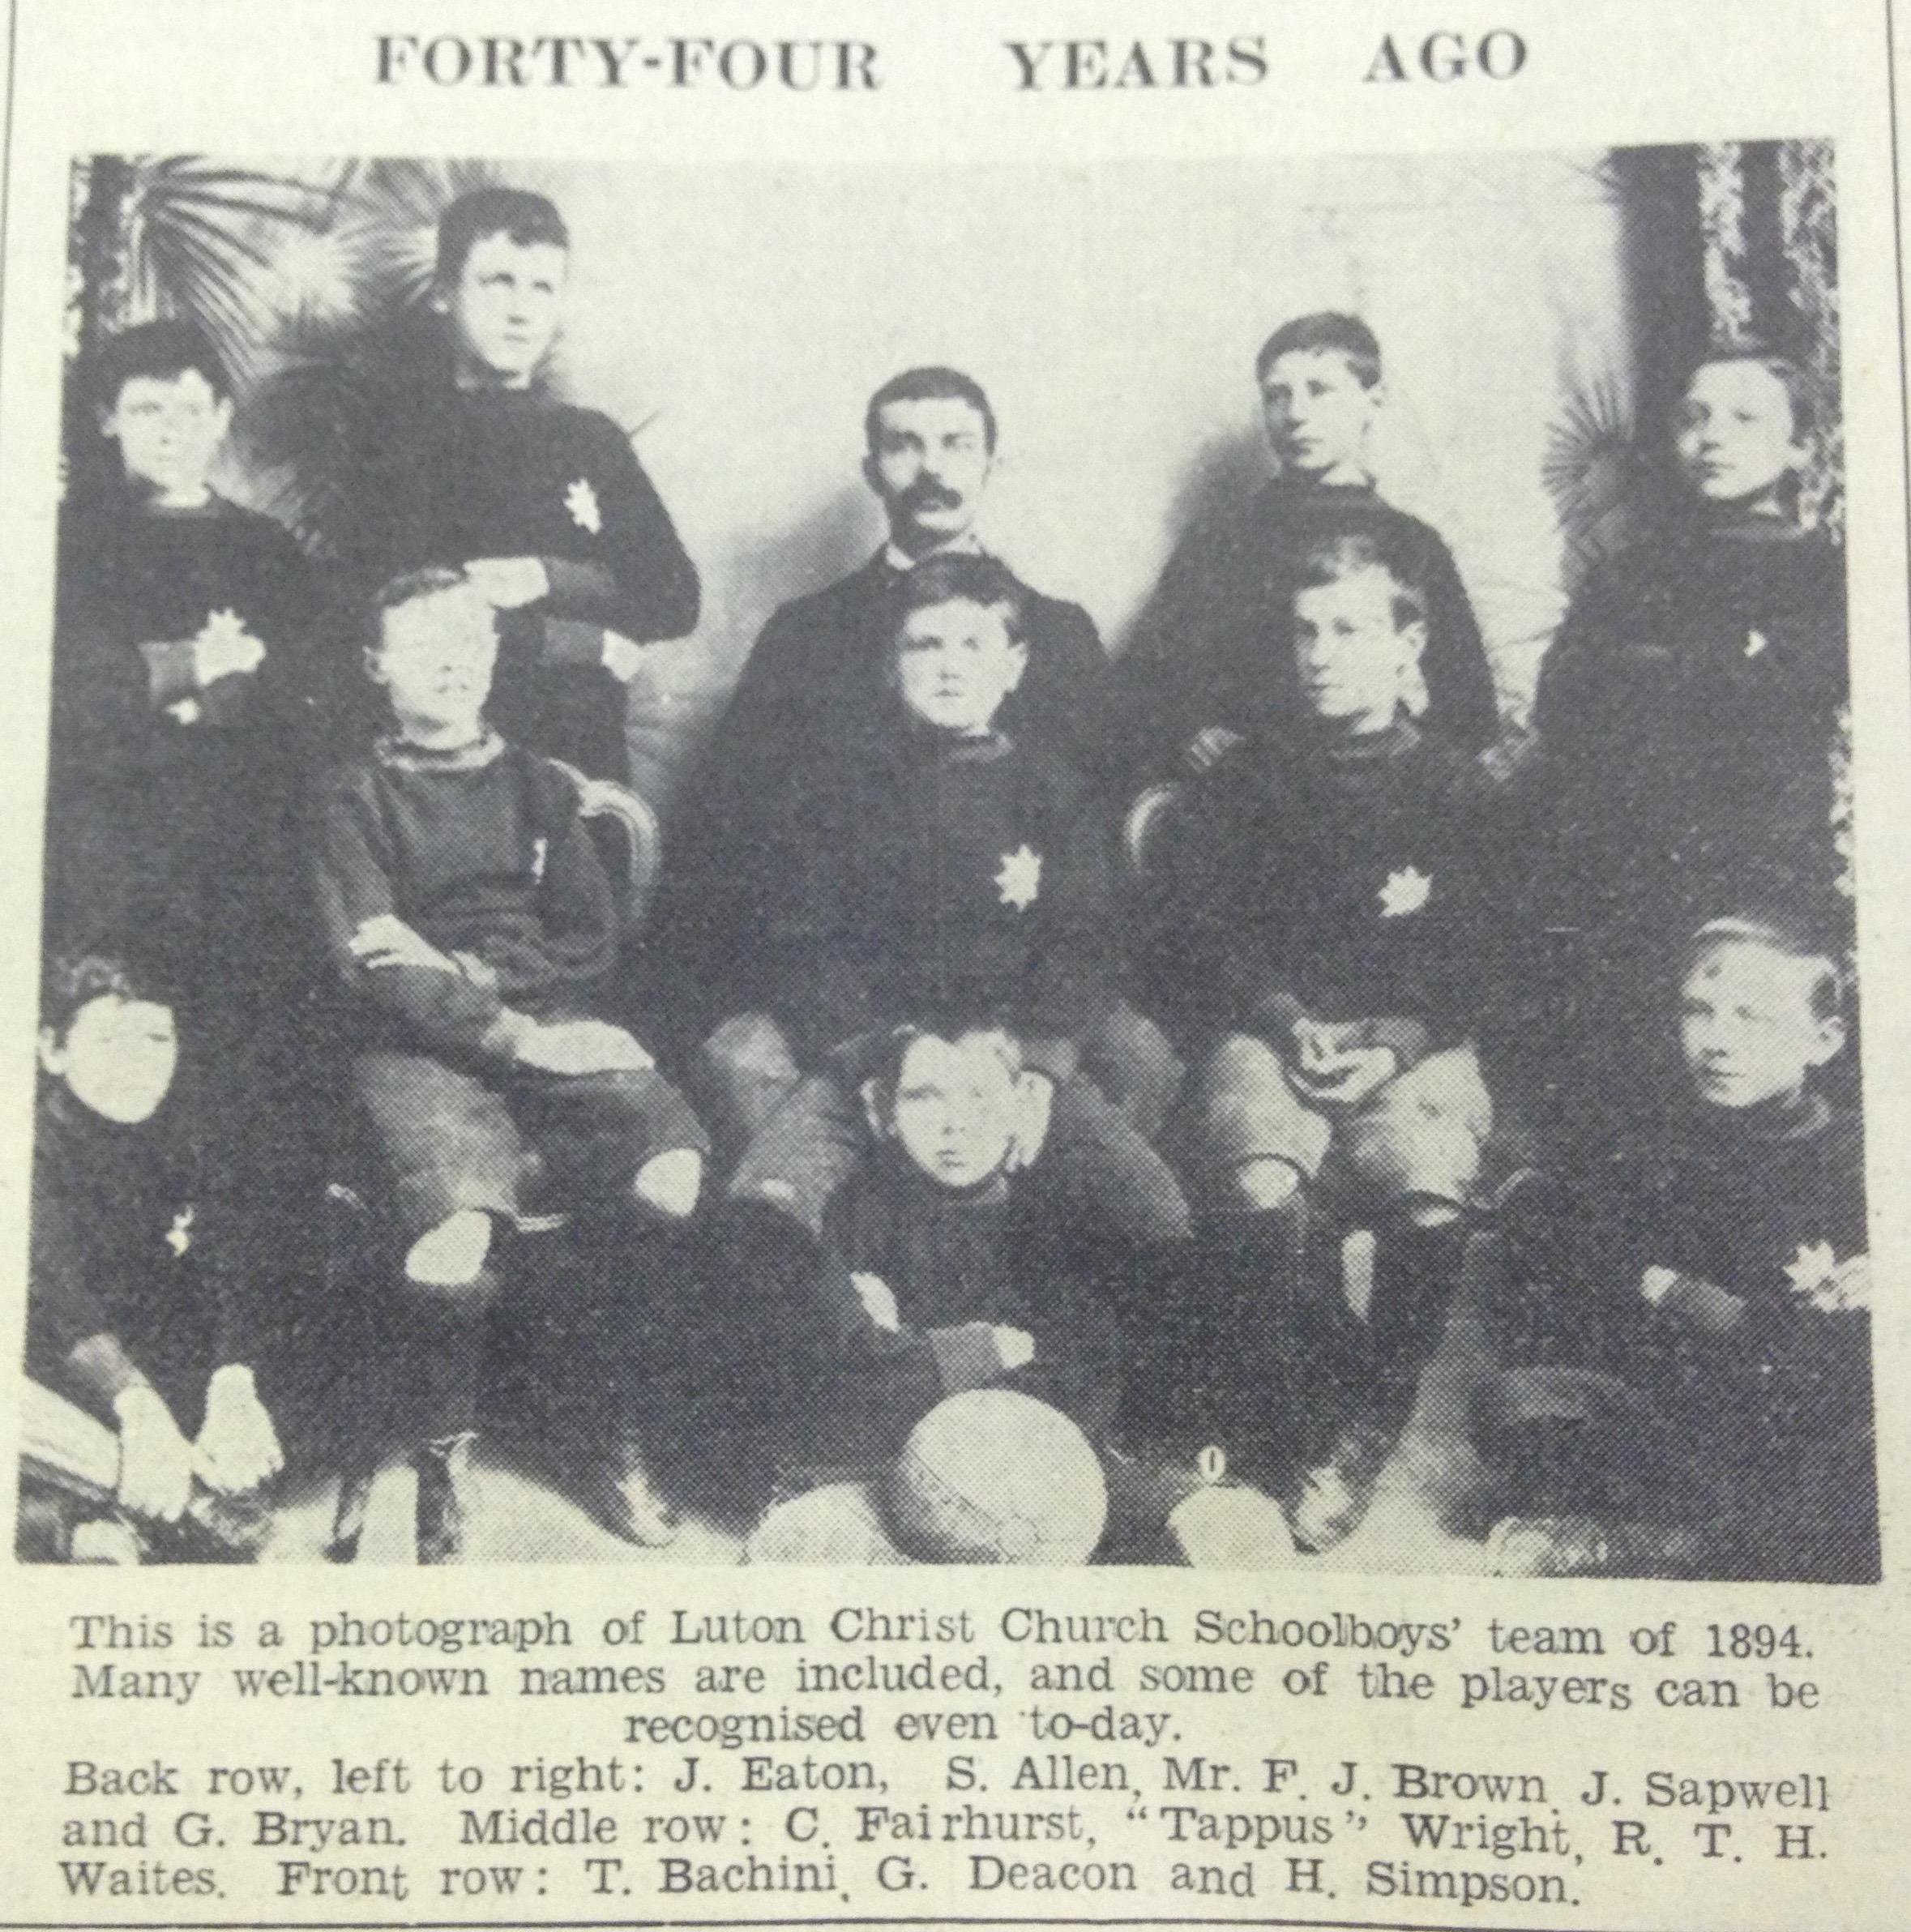 Christ Church Schoolboys, Luton 1894